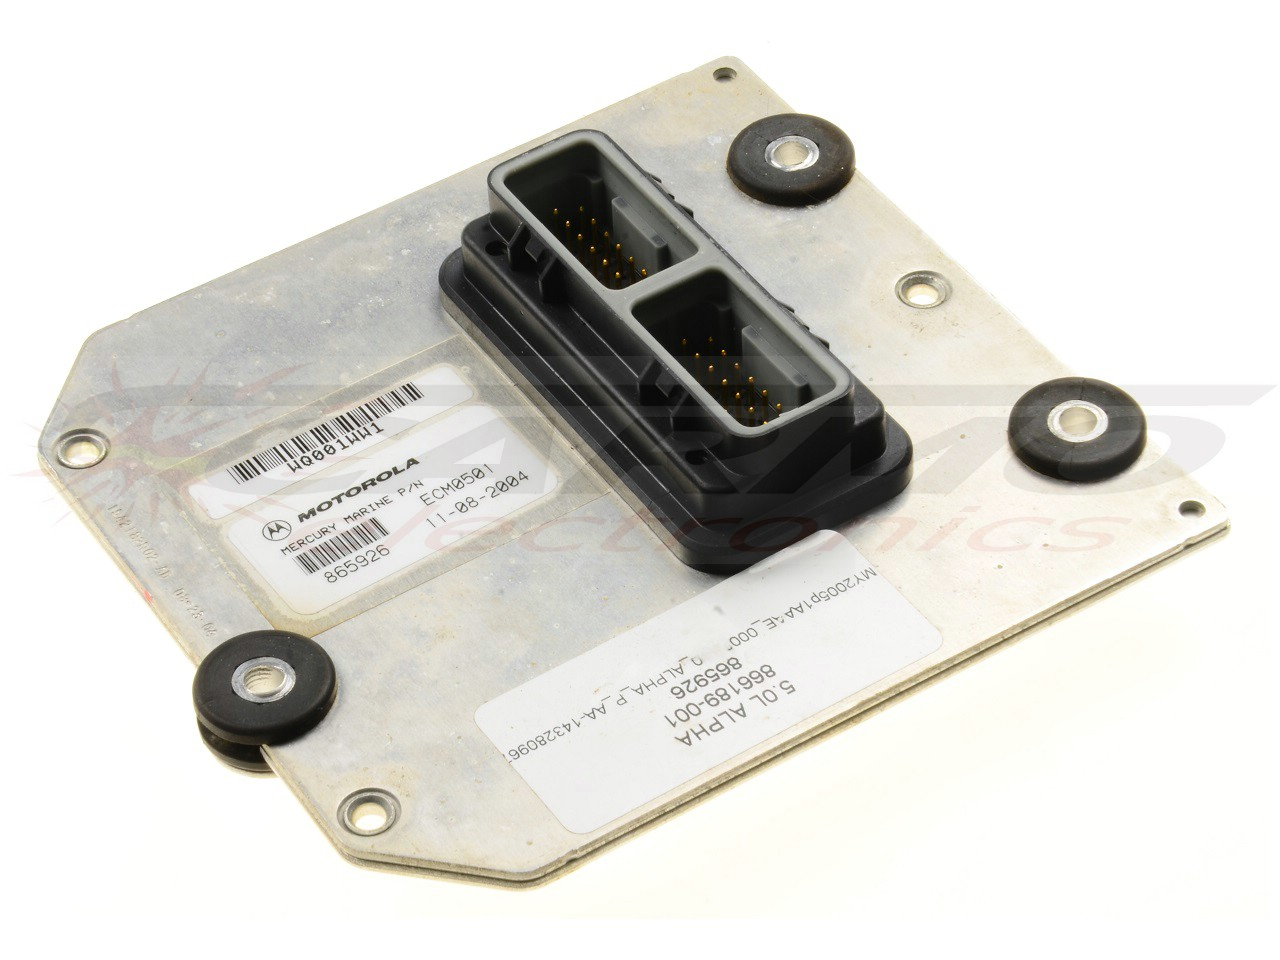 Mercruiser 5 0 V8 ECU ECM CDI black box computer brain